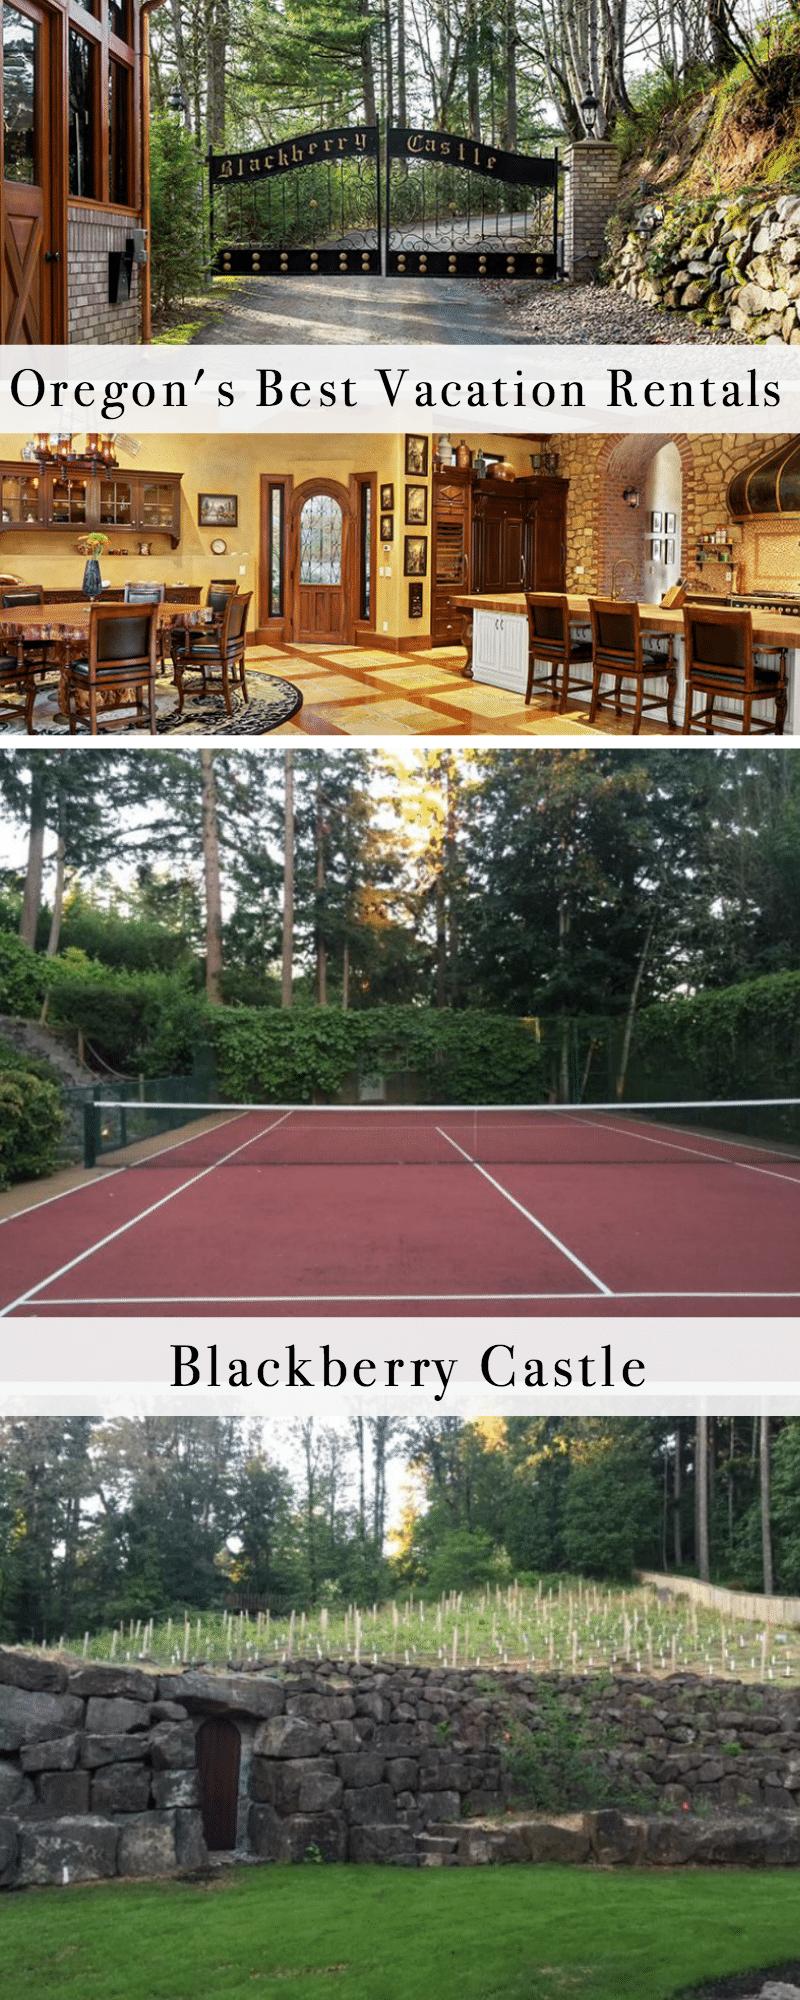 Oregon's Best Vacation Rentals: Blackberry Castle